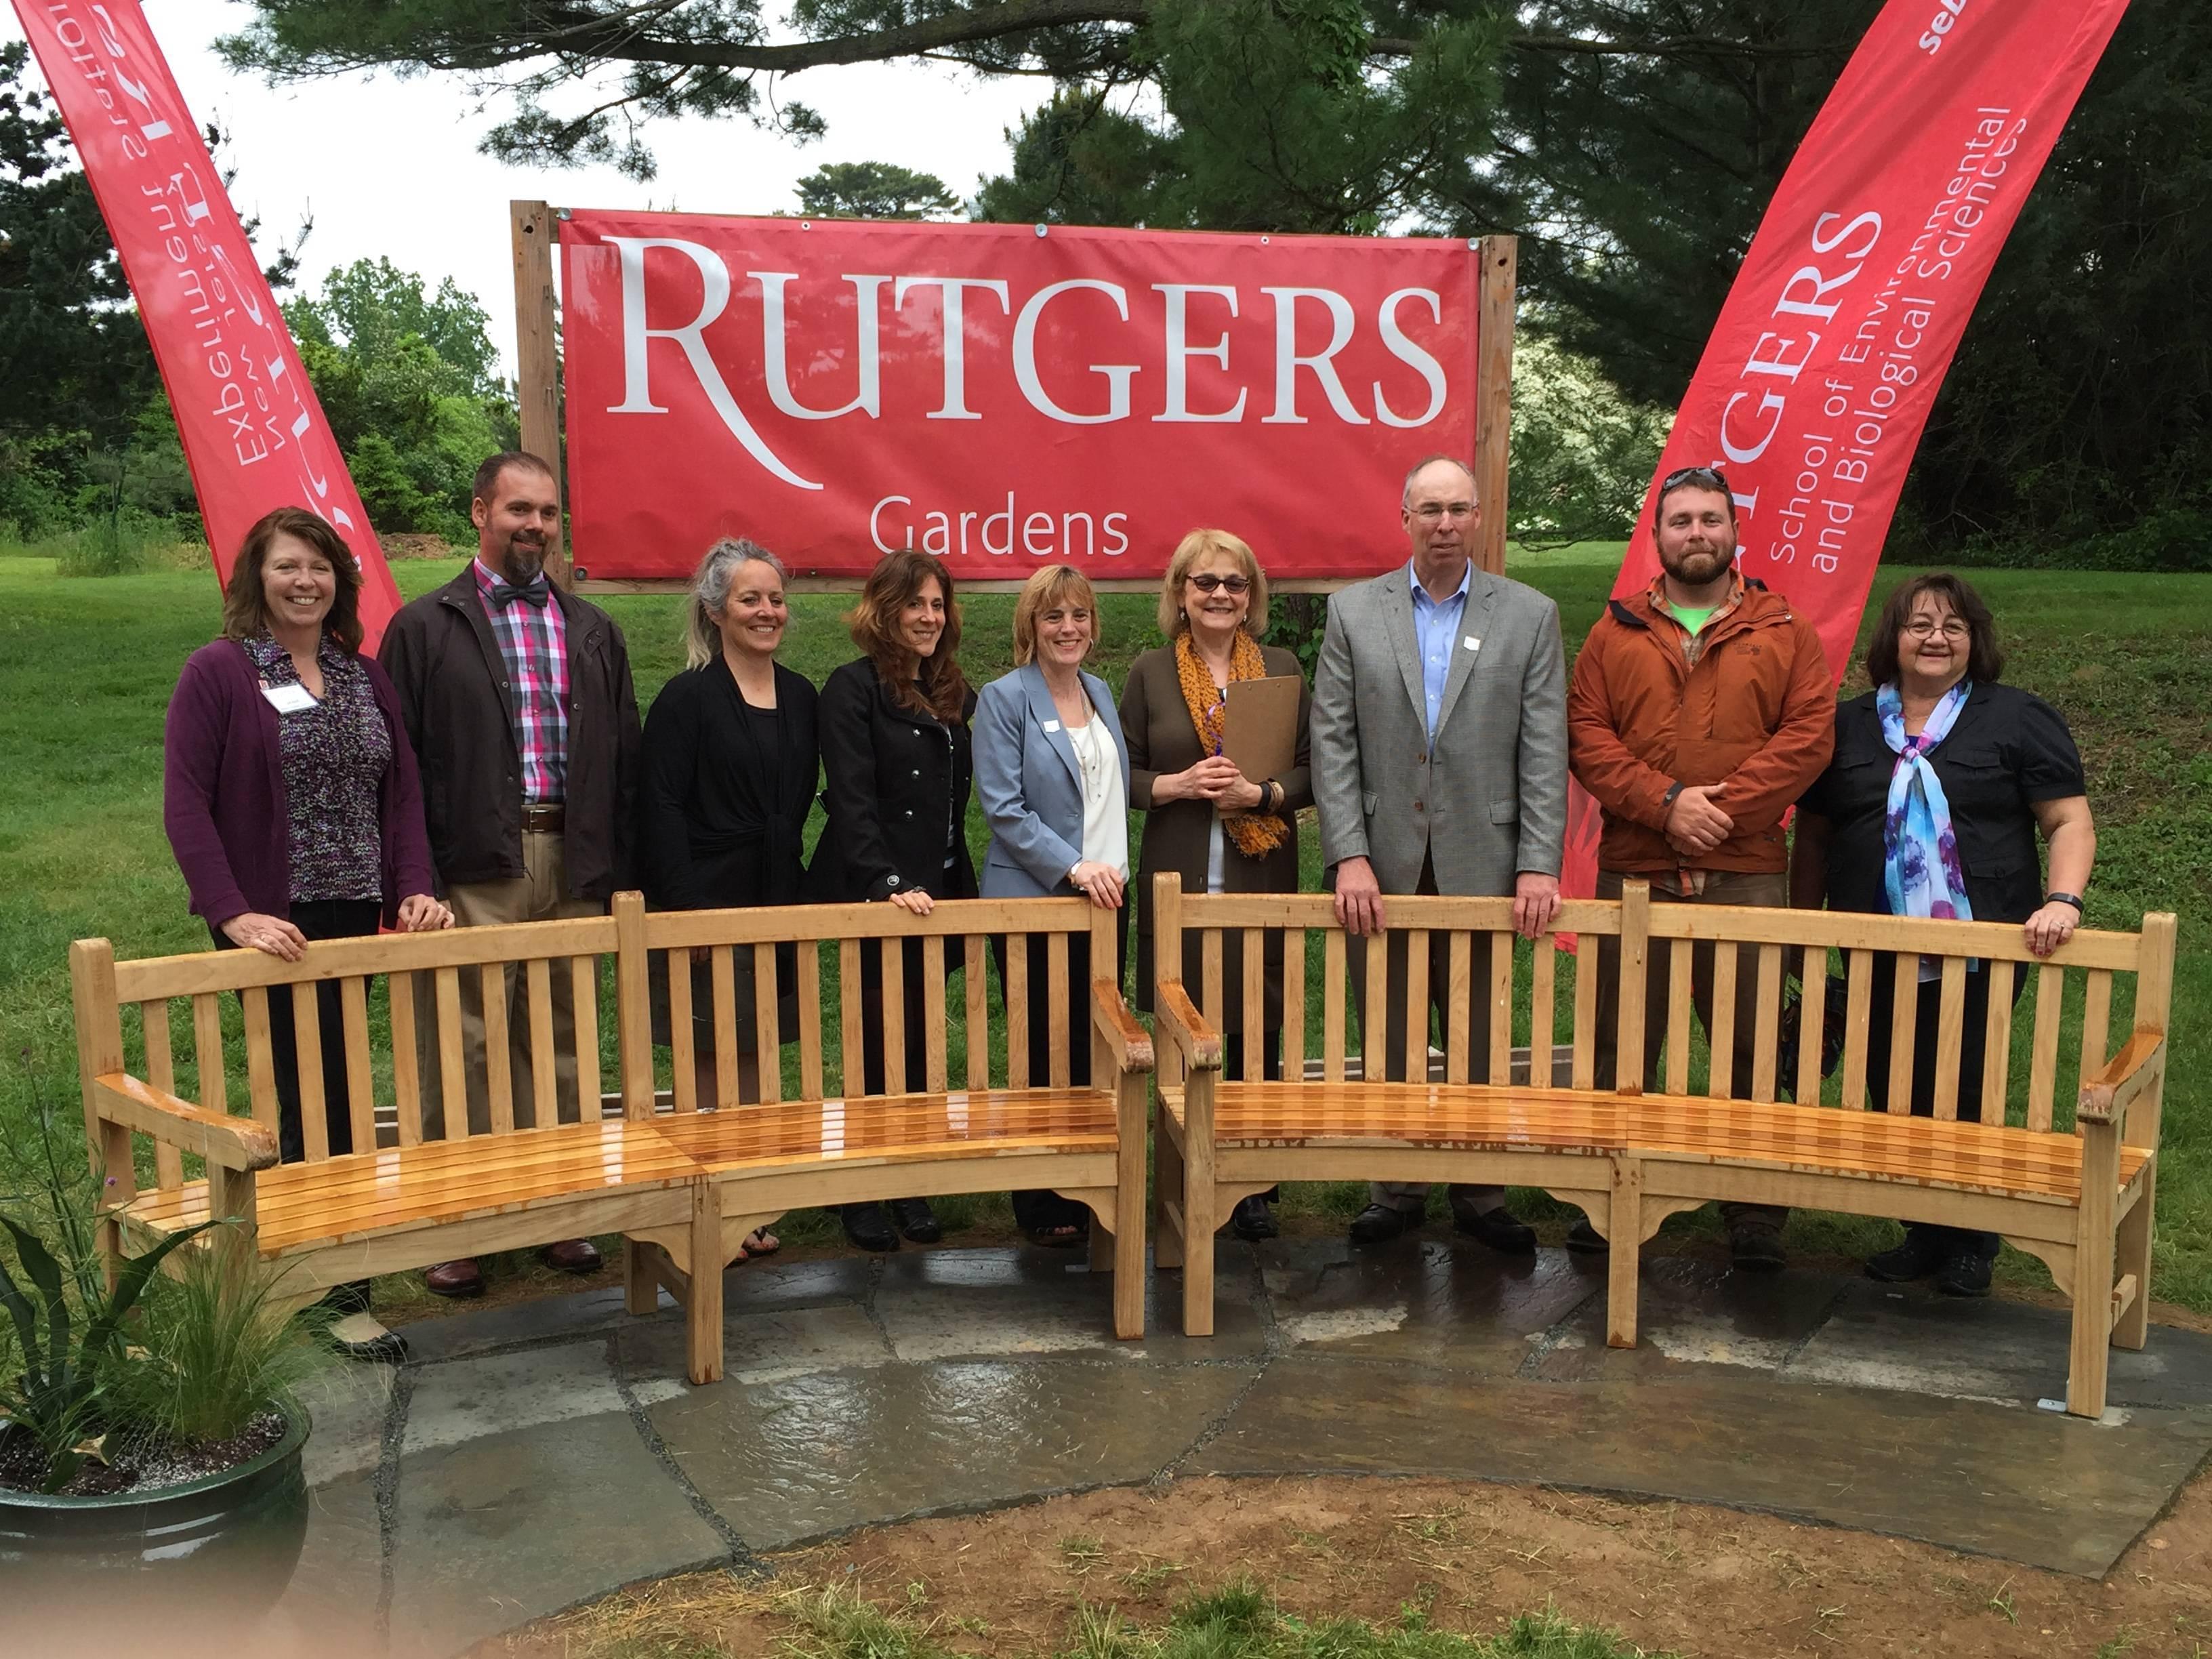 43d222aec87a7becb026_Rutgers_Garden_Ceremony_007.JPG